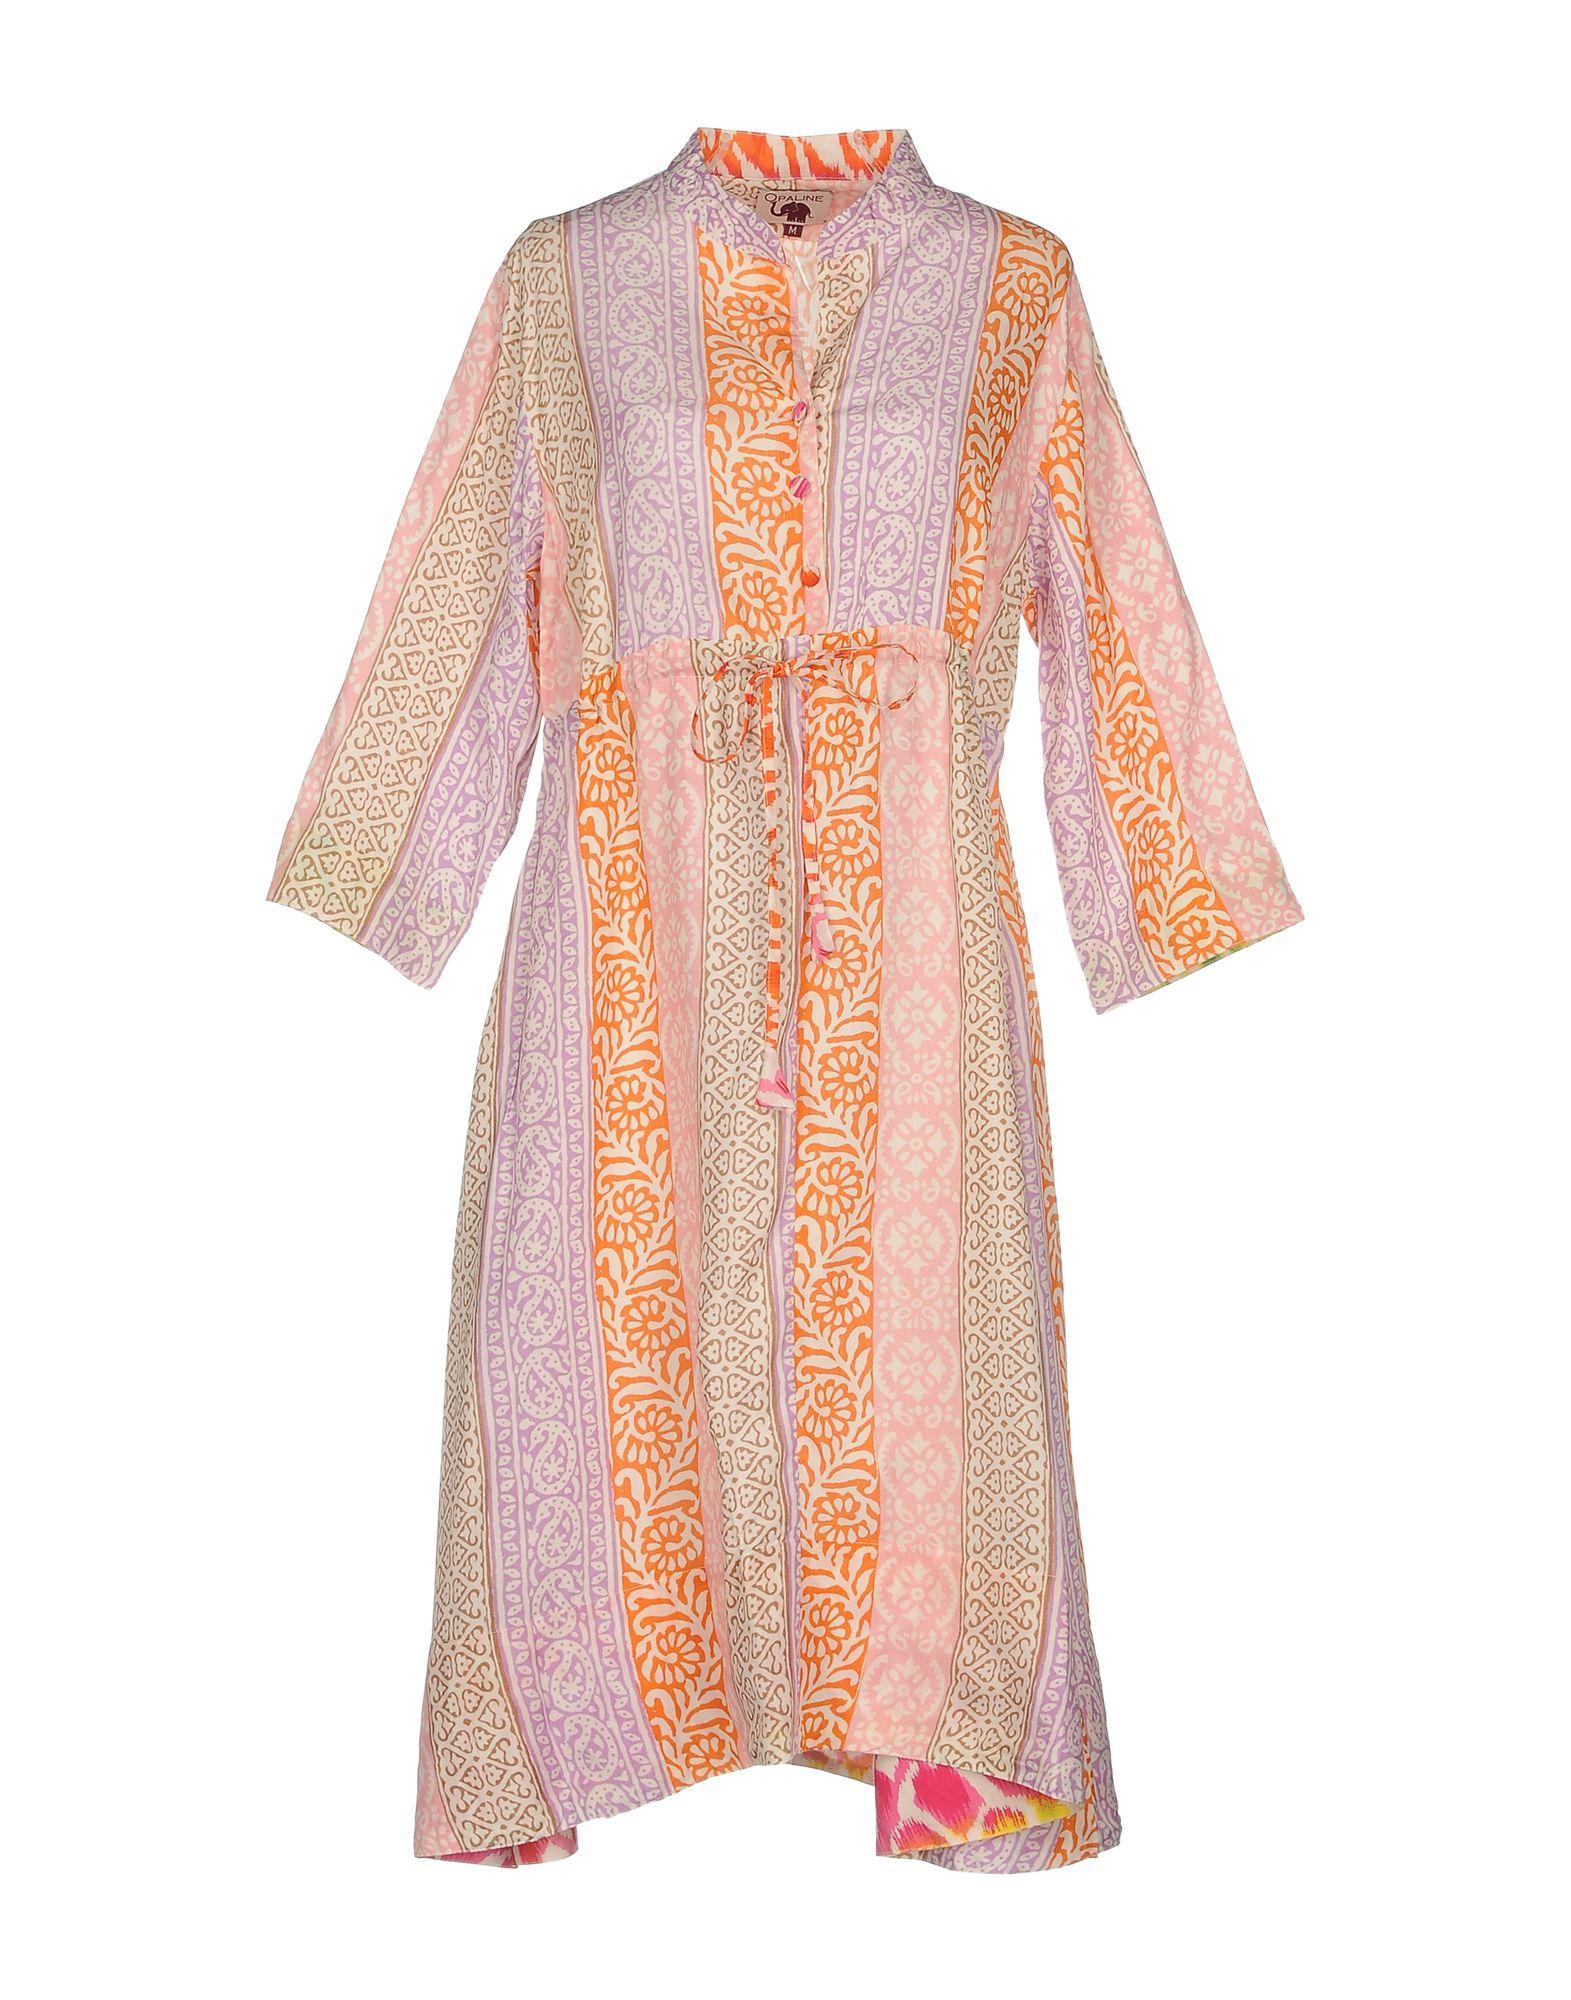 OPALINE Платье до колена sly010 платье до колена